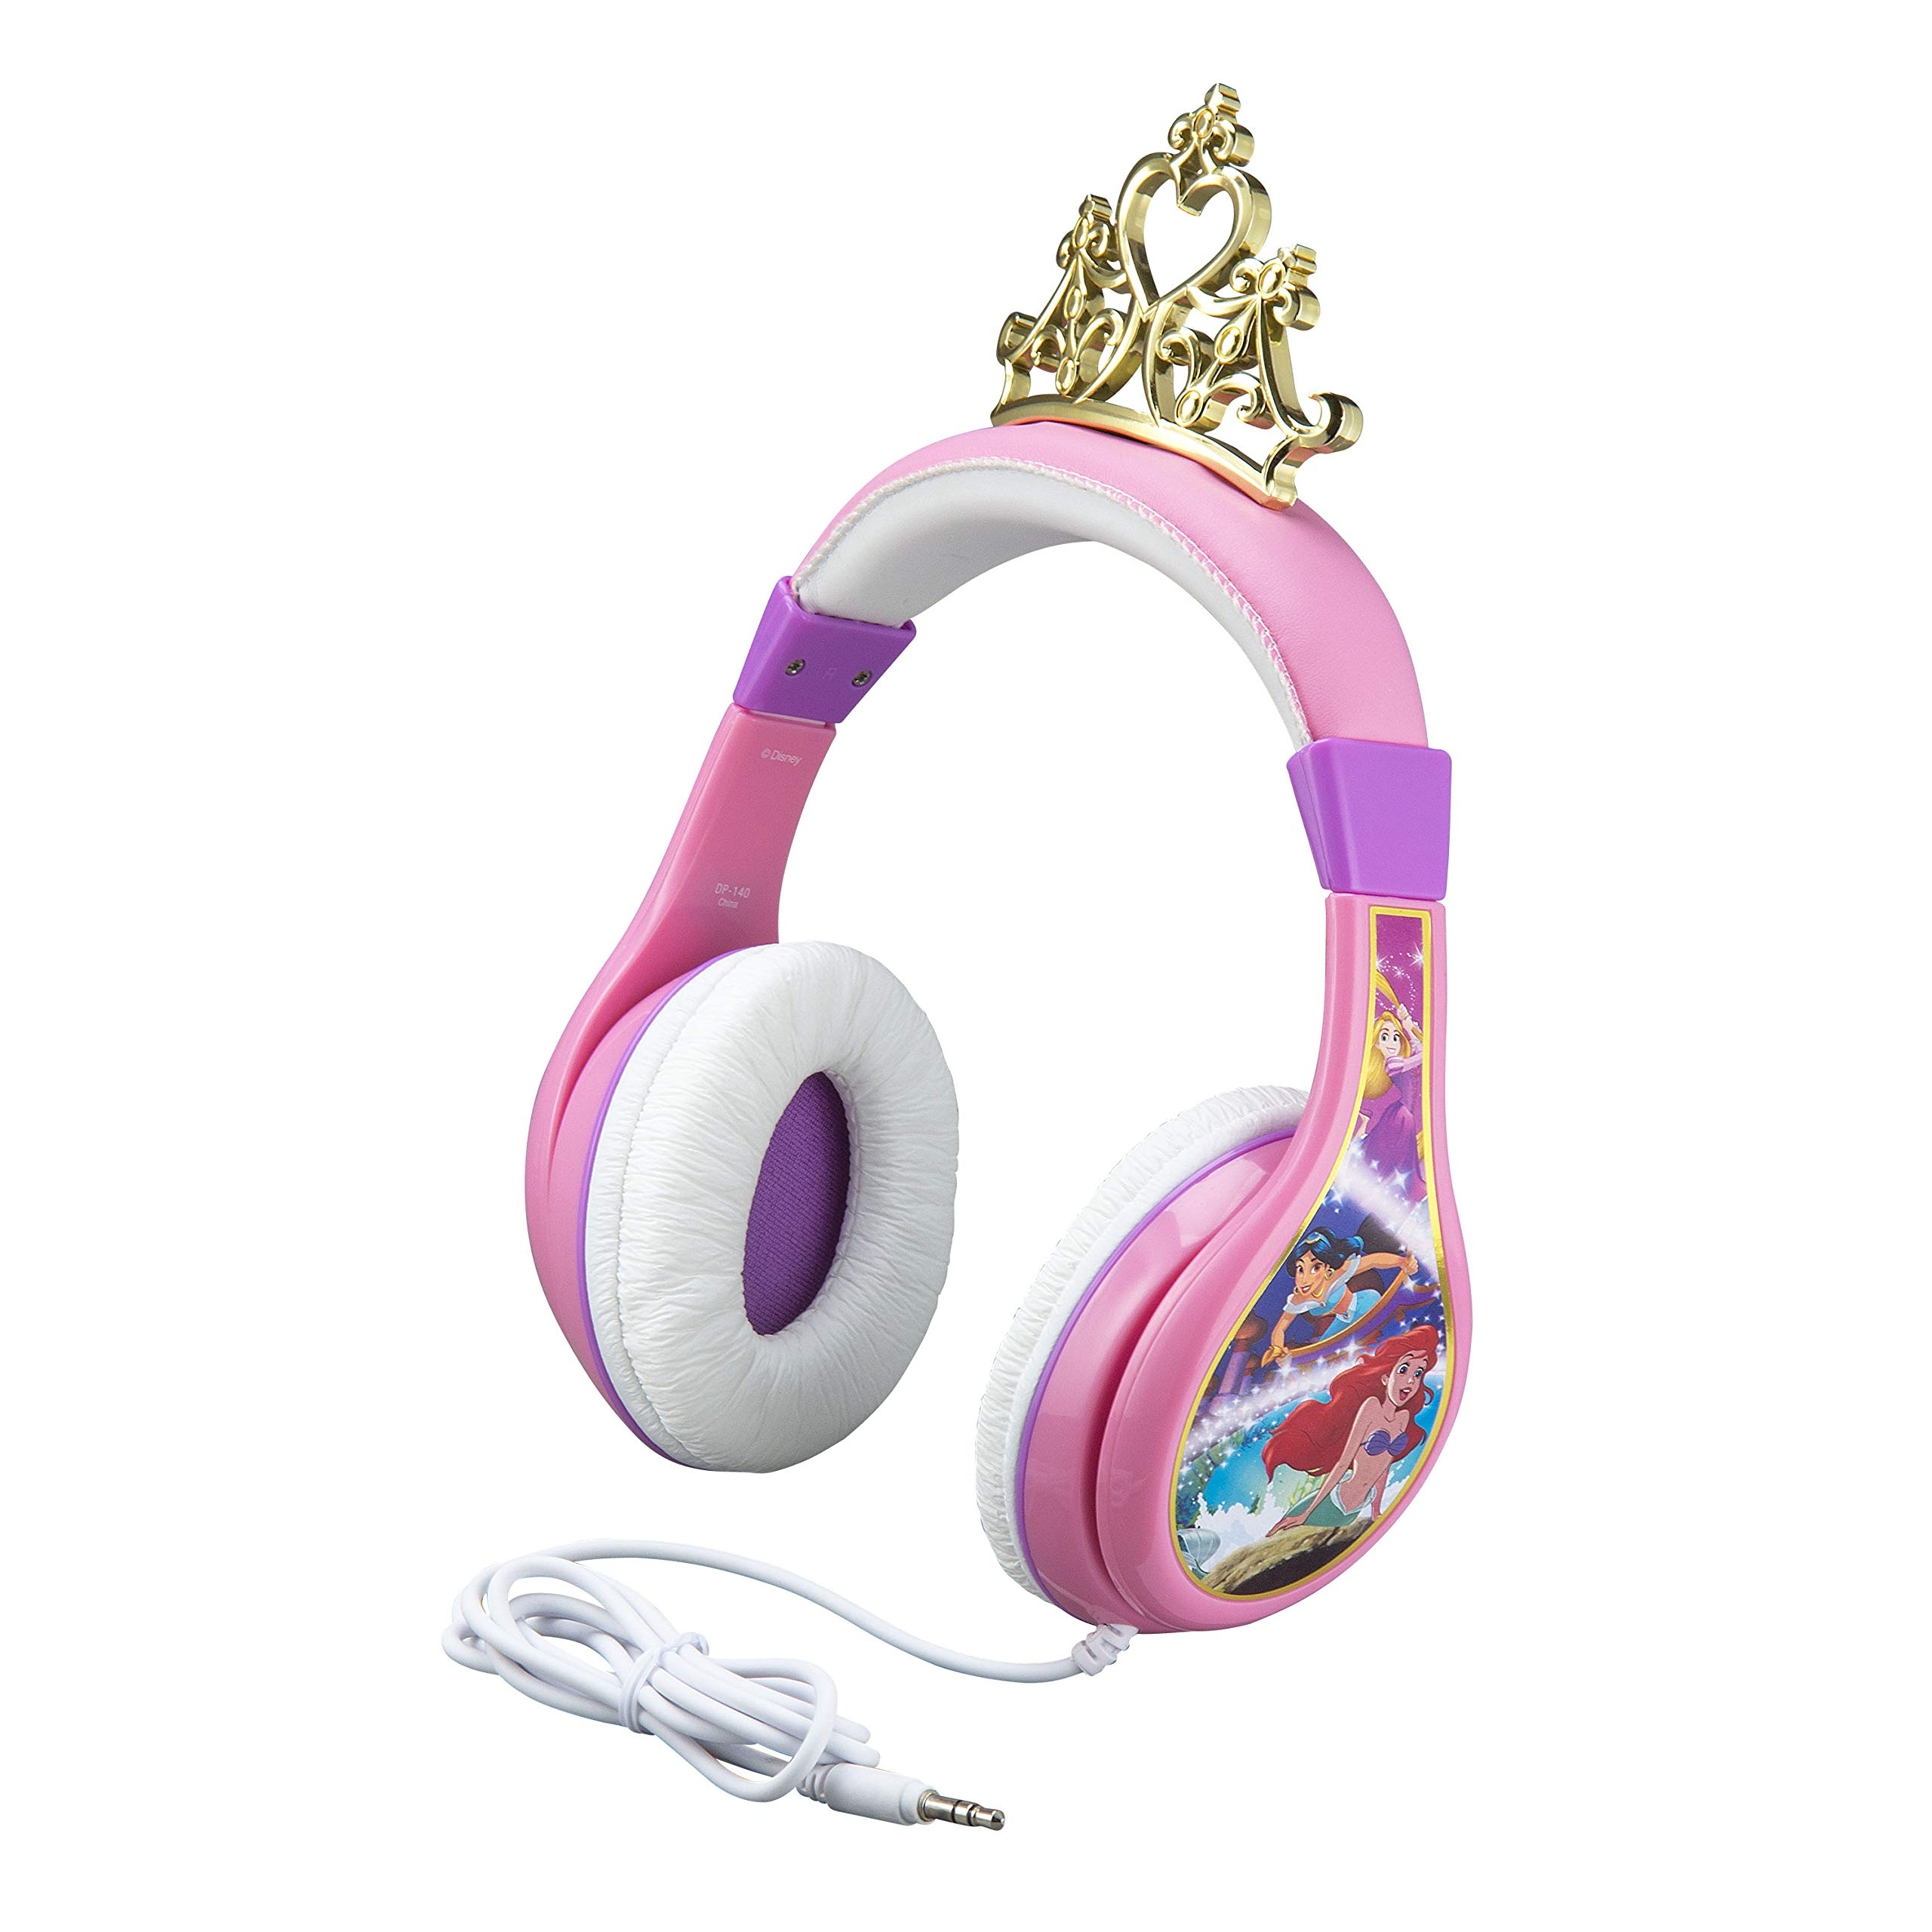 Disney Princess Kids Headphones For Kids Adjustable Stereo Tangle-Free 3.5Mm Jack Wired Cord Over Ear Headset For Children Parental Volume Control Kid Friendly Safe (Frustration Free Packaging)